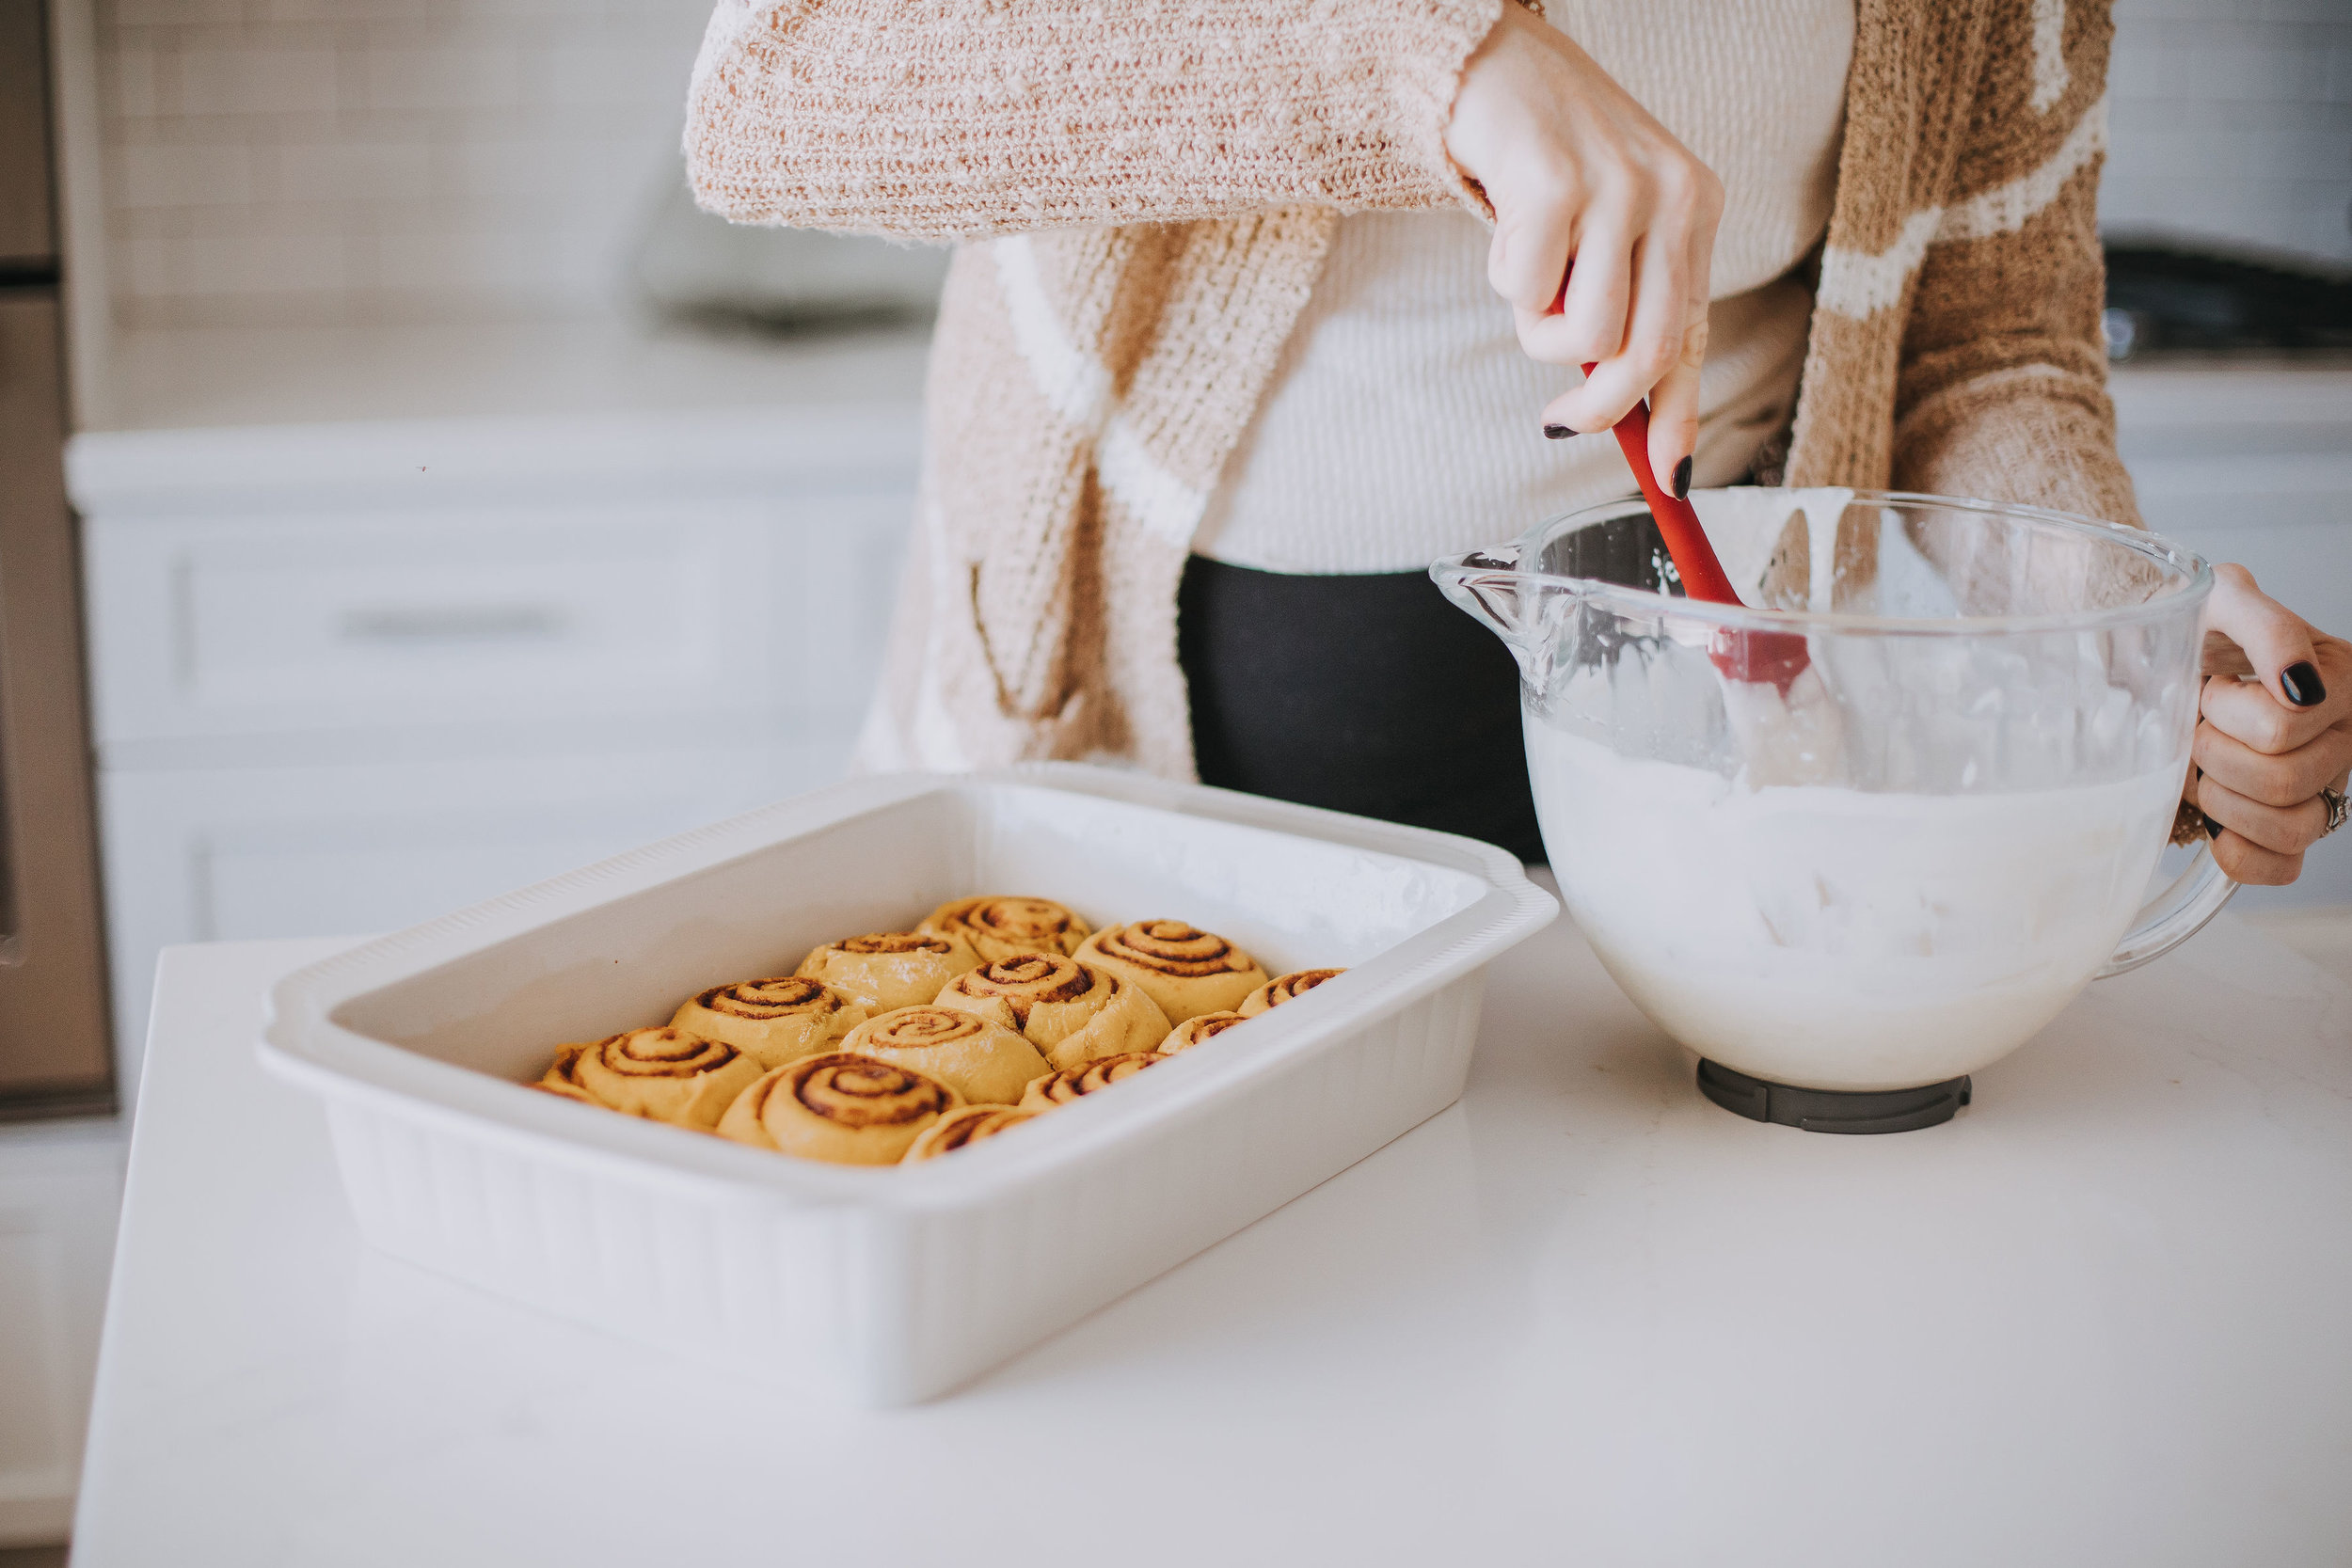 - Frosting½ bag of Powdered Sugar4 T softened Butter2 T Milk1 tsp Vanilla